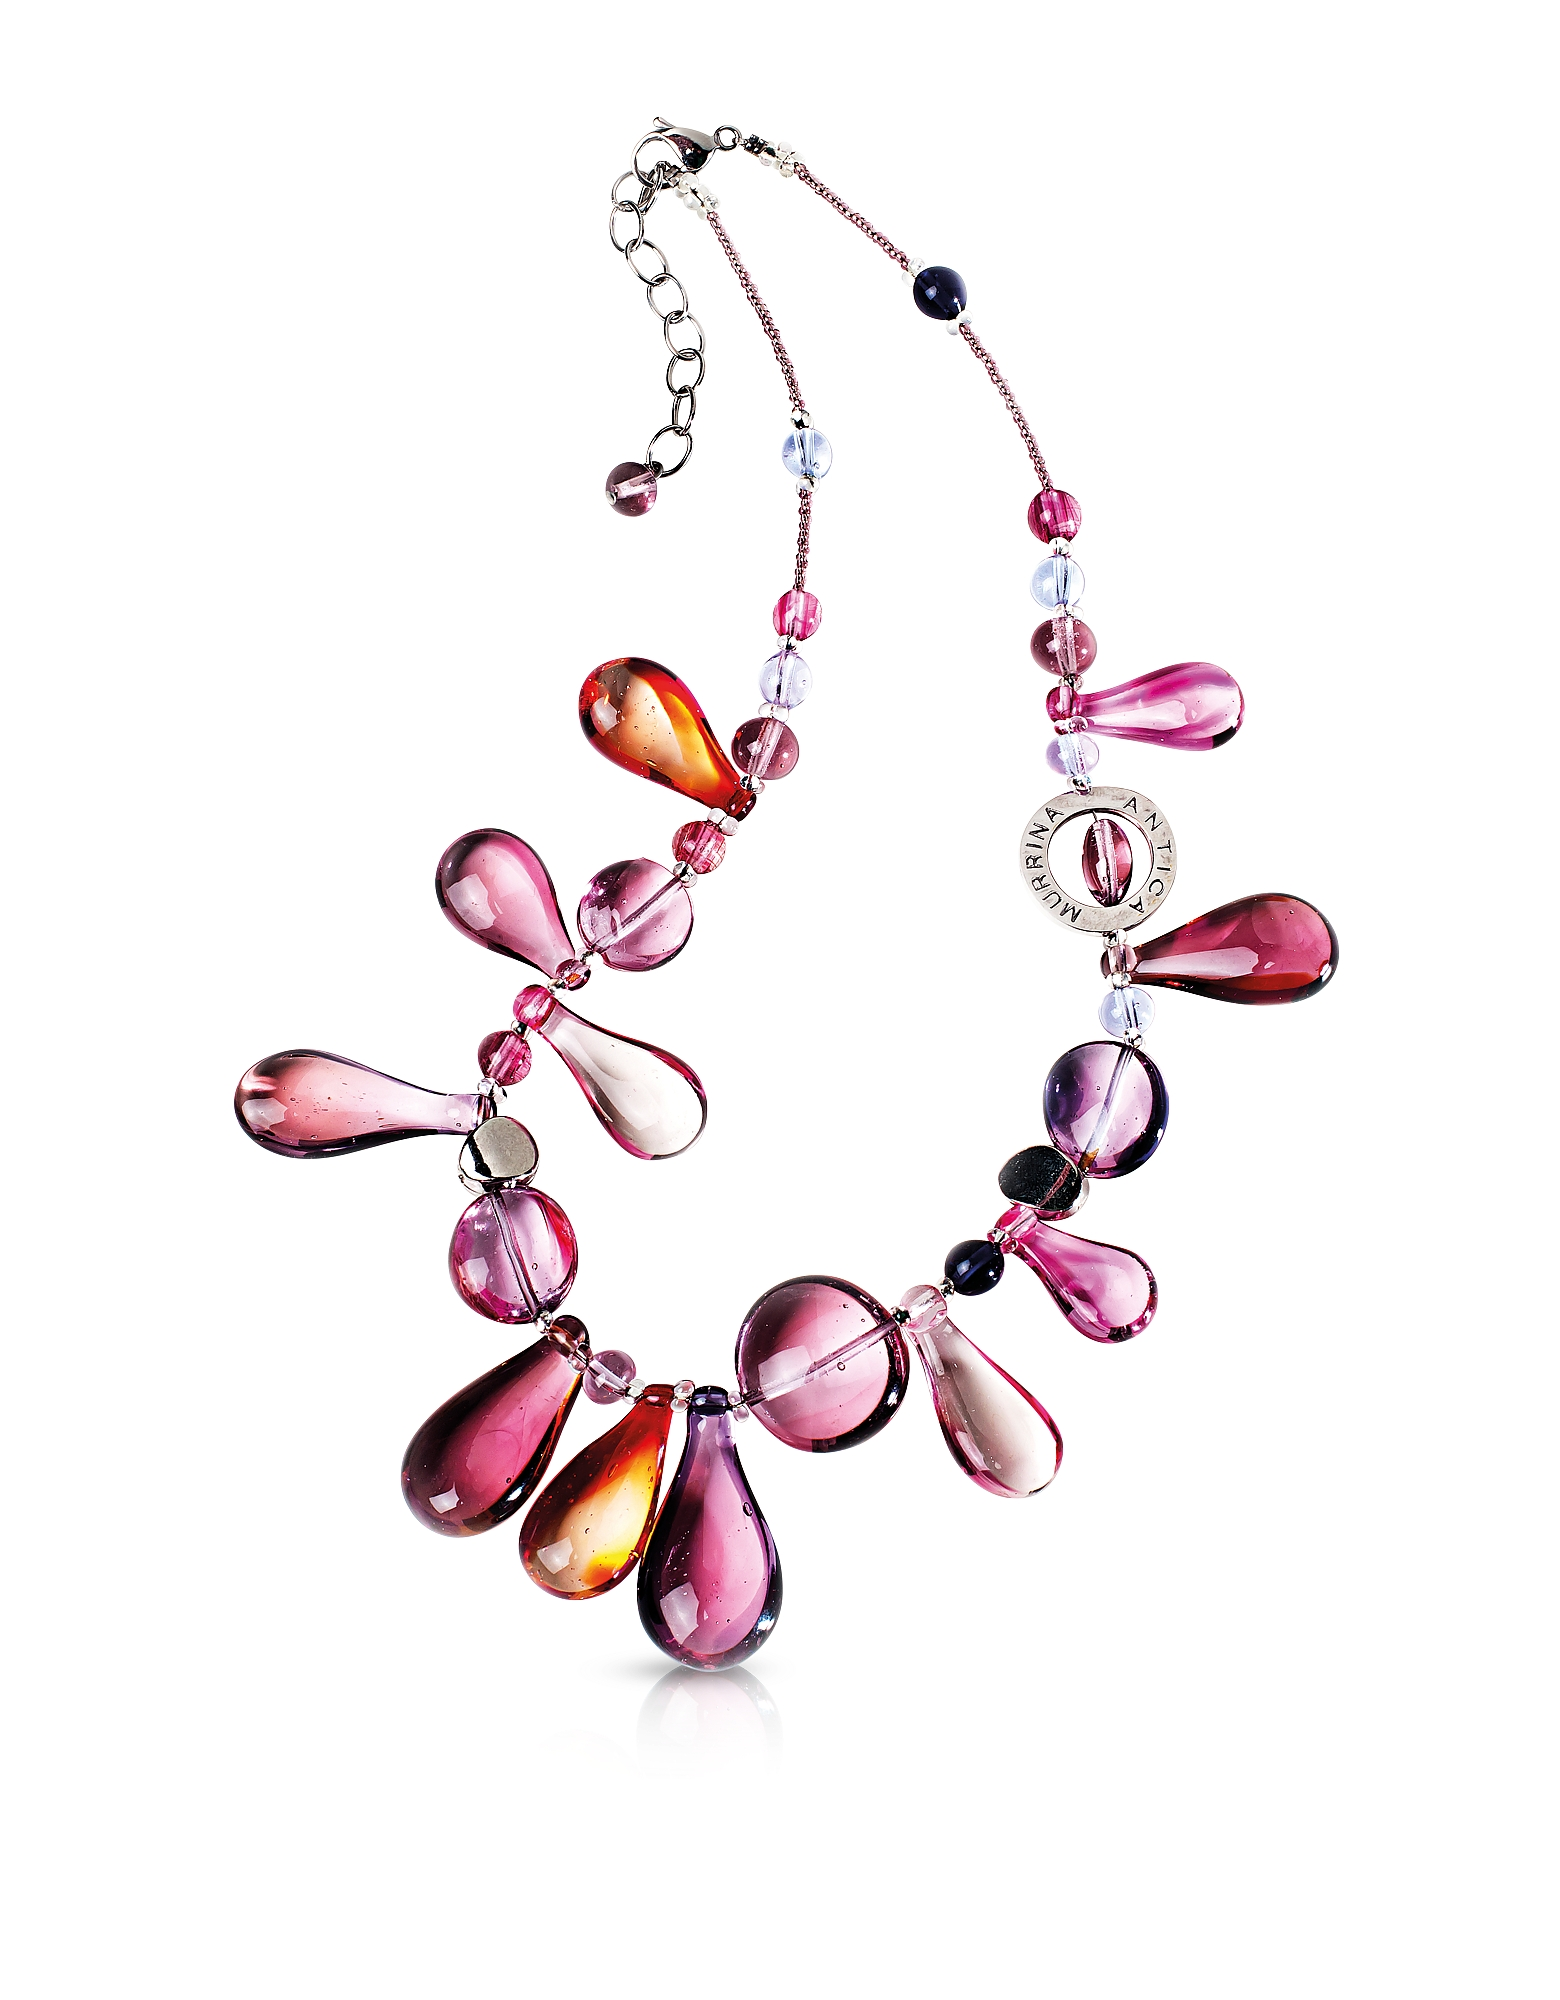 Lapilli - Ожерелье из Стекла Мурано